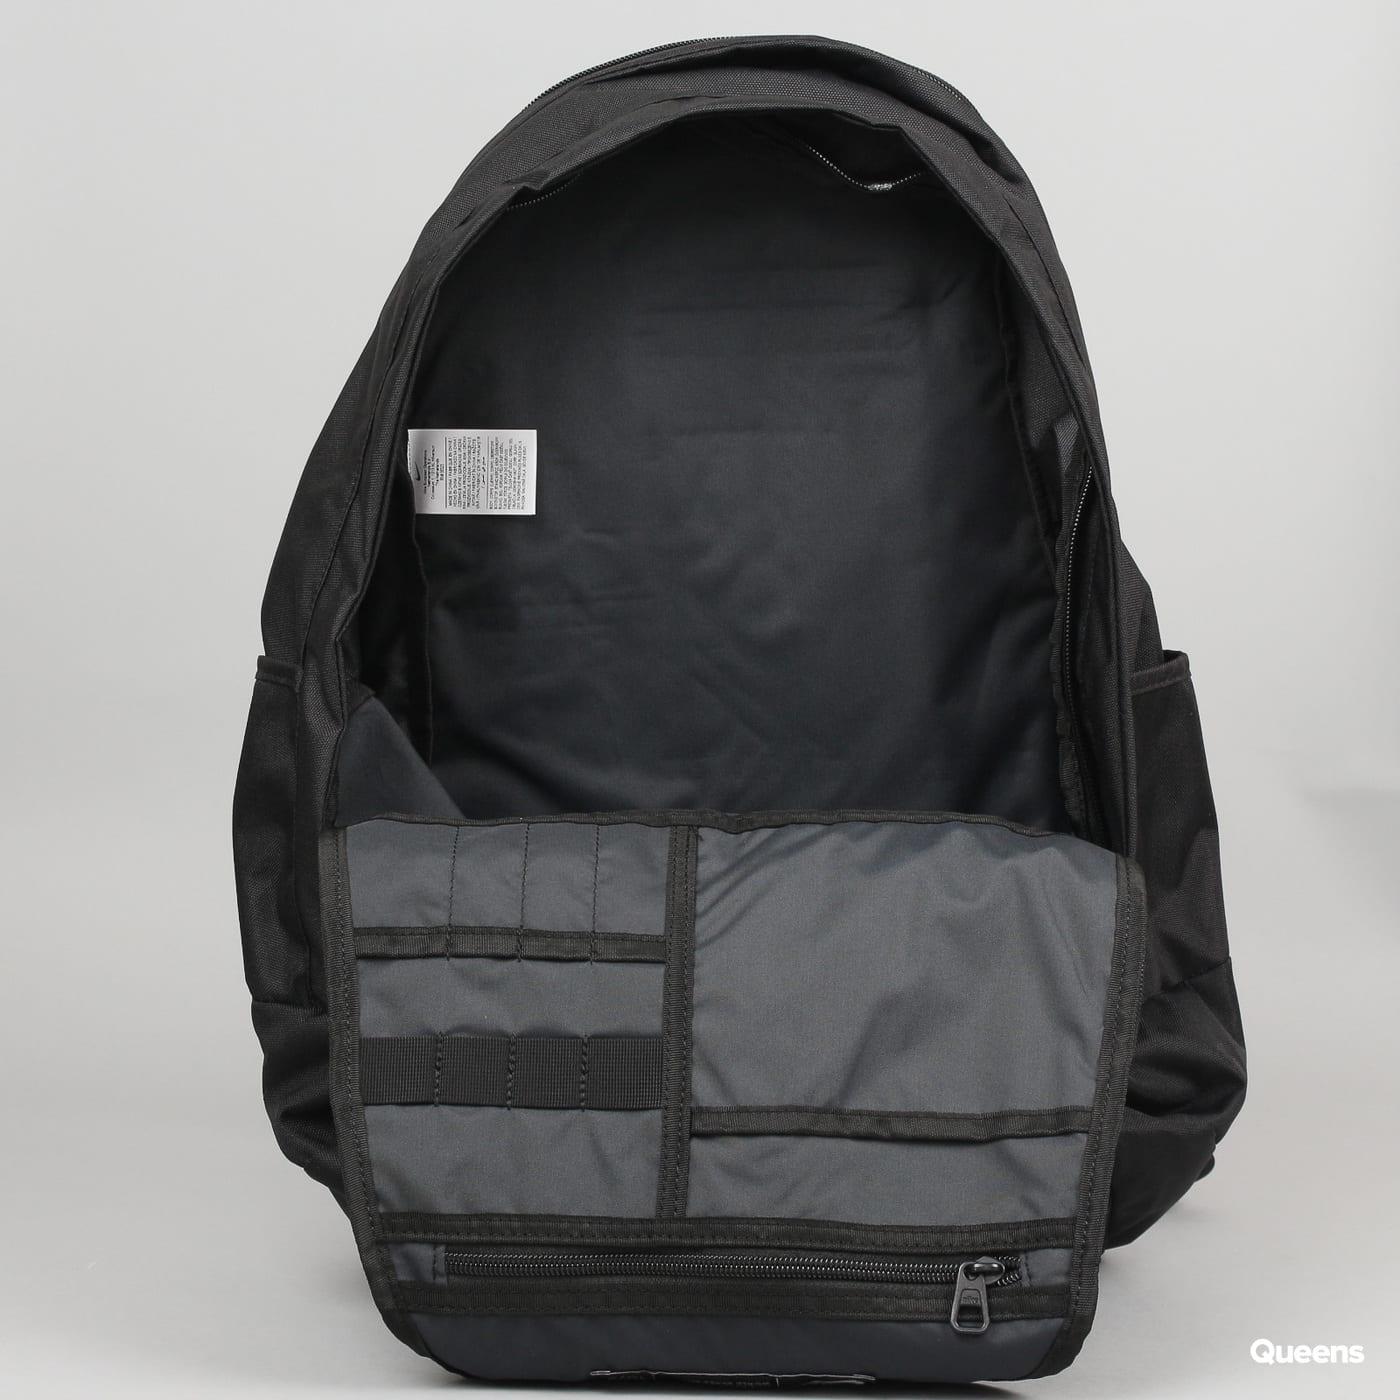 14802c4b55bbf Zoom in Zoom in Zoom in Zoom in Zoom in. Nike Cheyenne 3.0 - Solid black